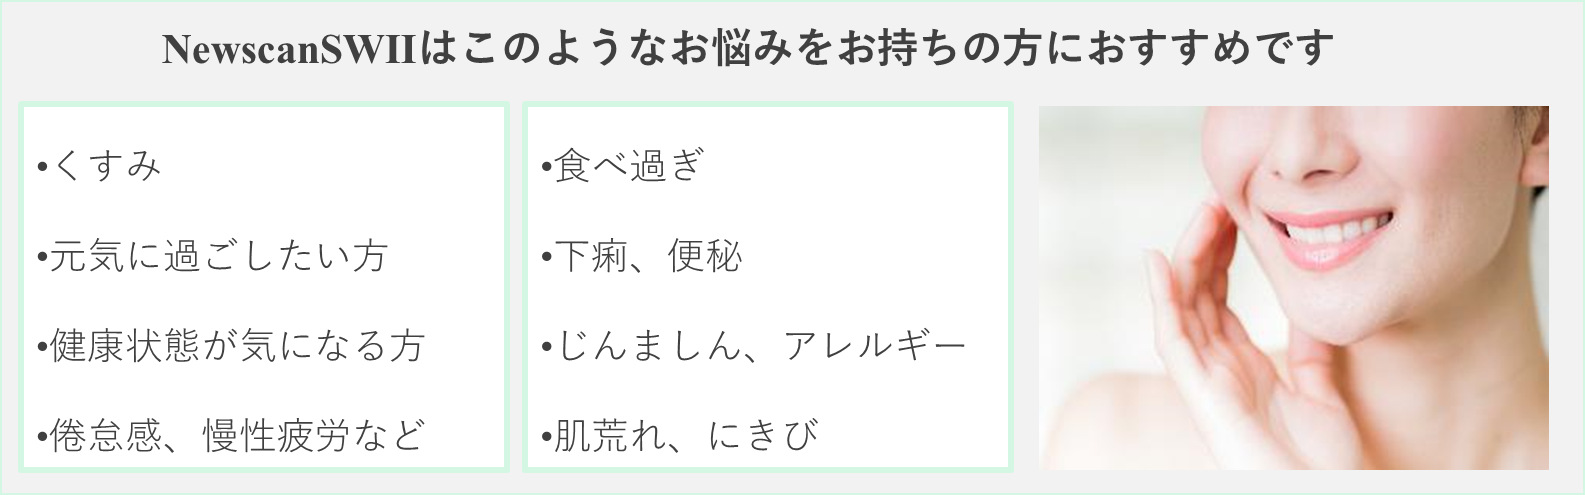 Newscan3